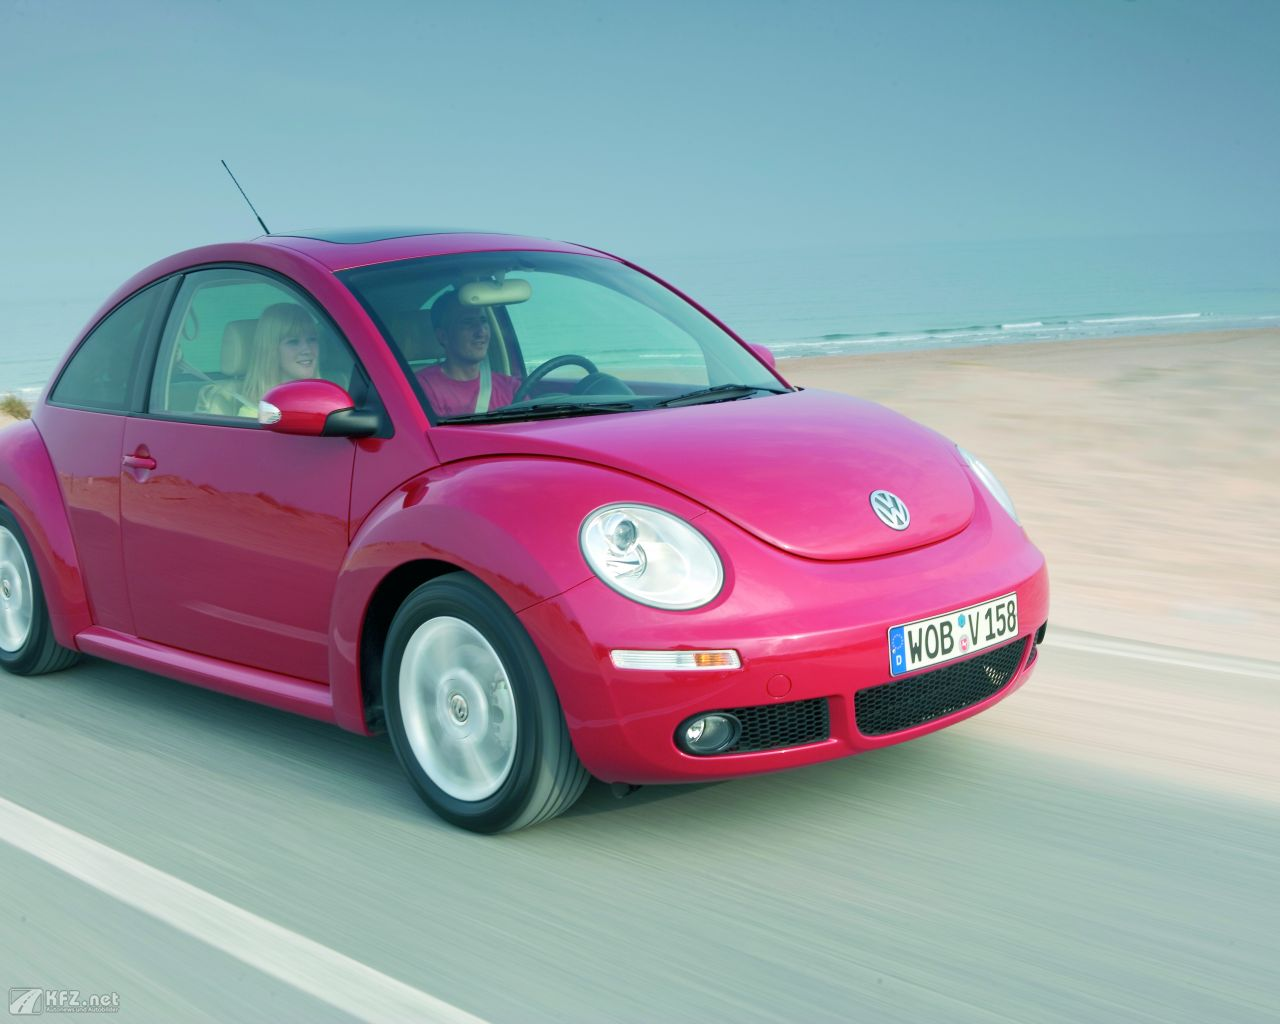 vw-beetle-1280x1024-7